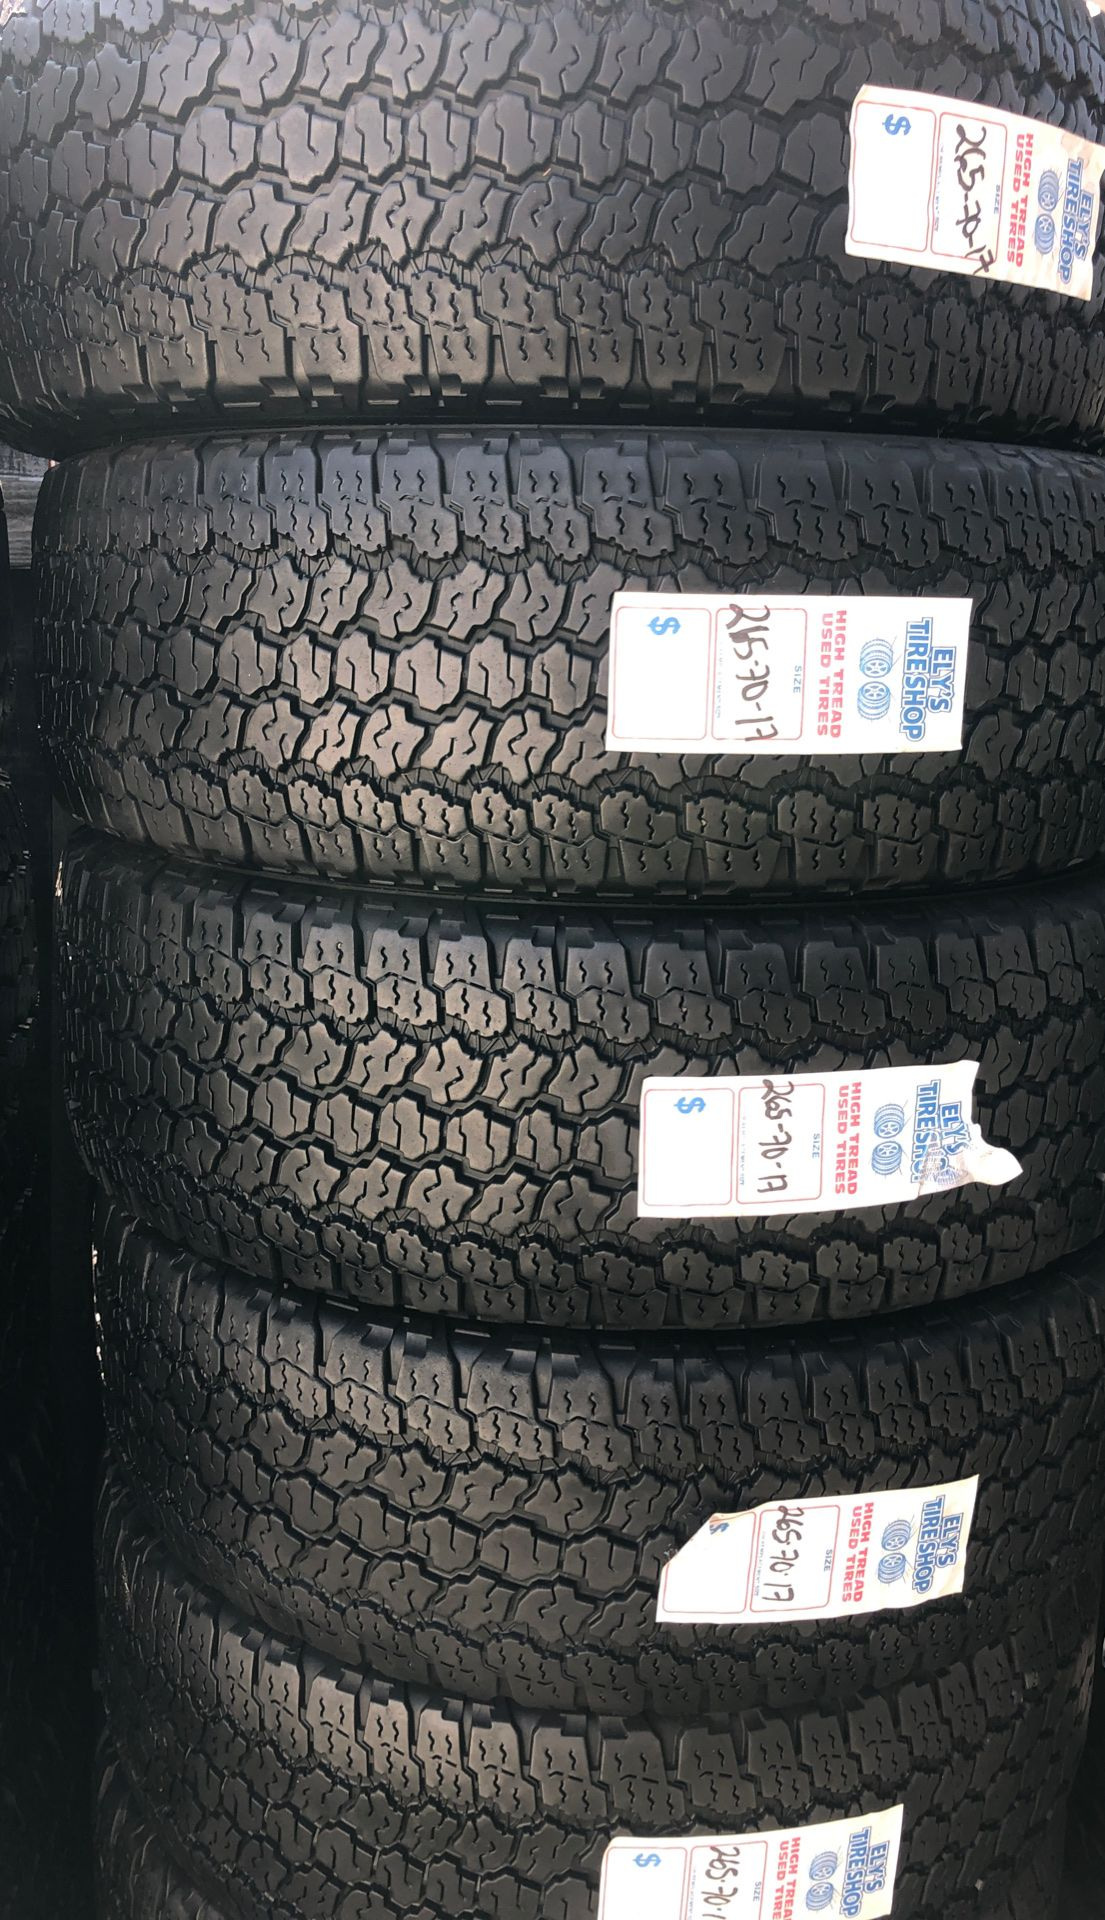 4 tires 265/70r17 Goodyear